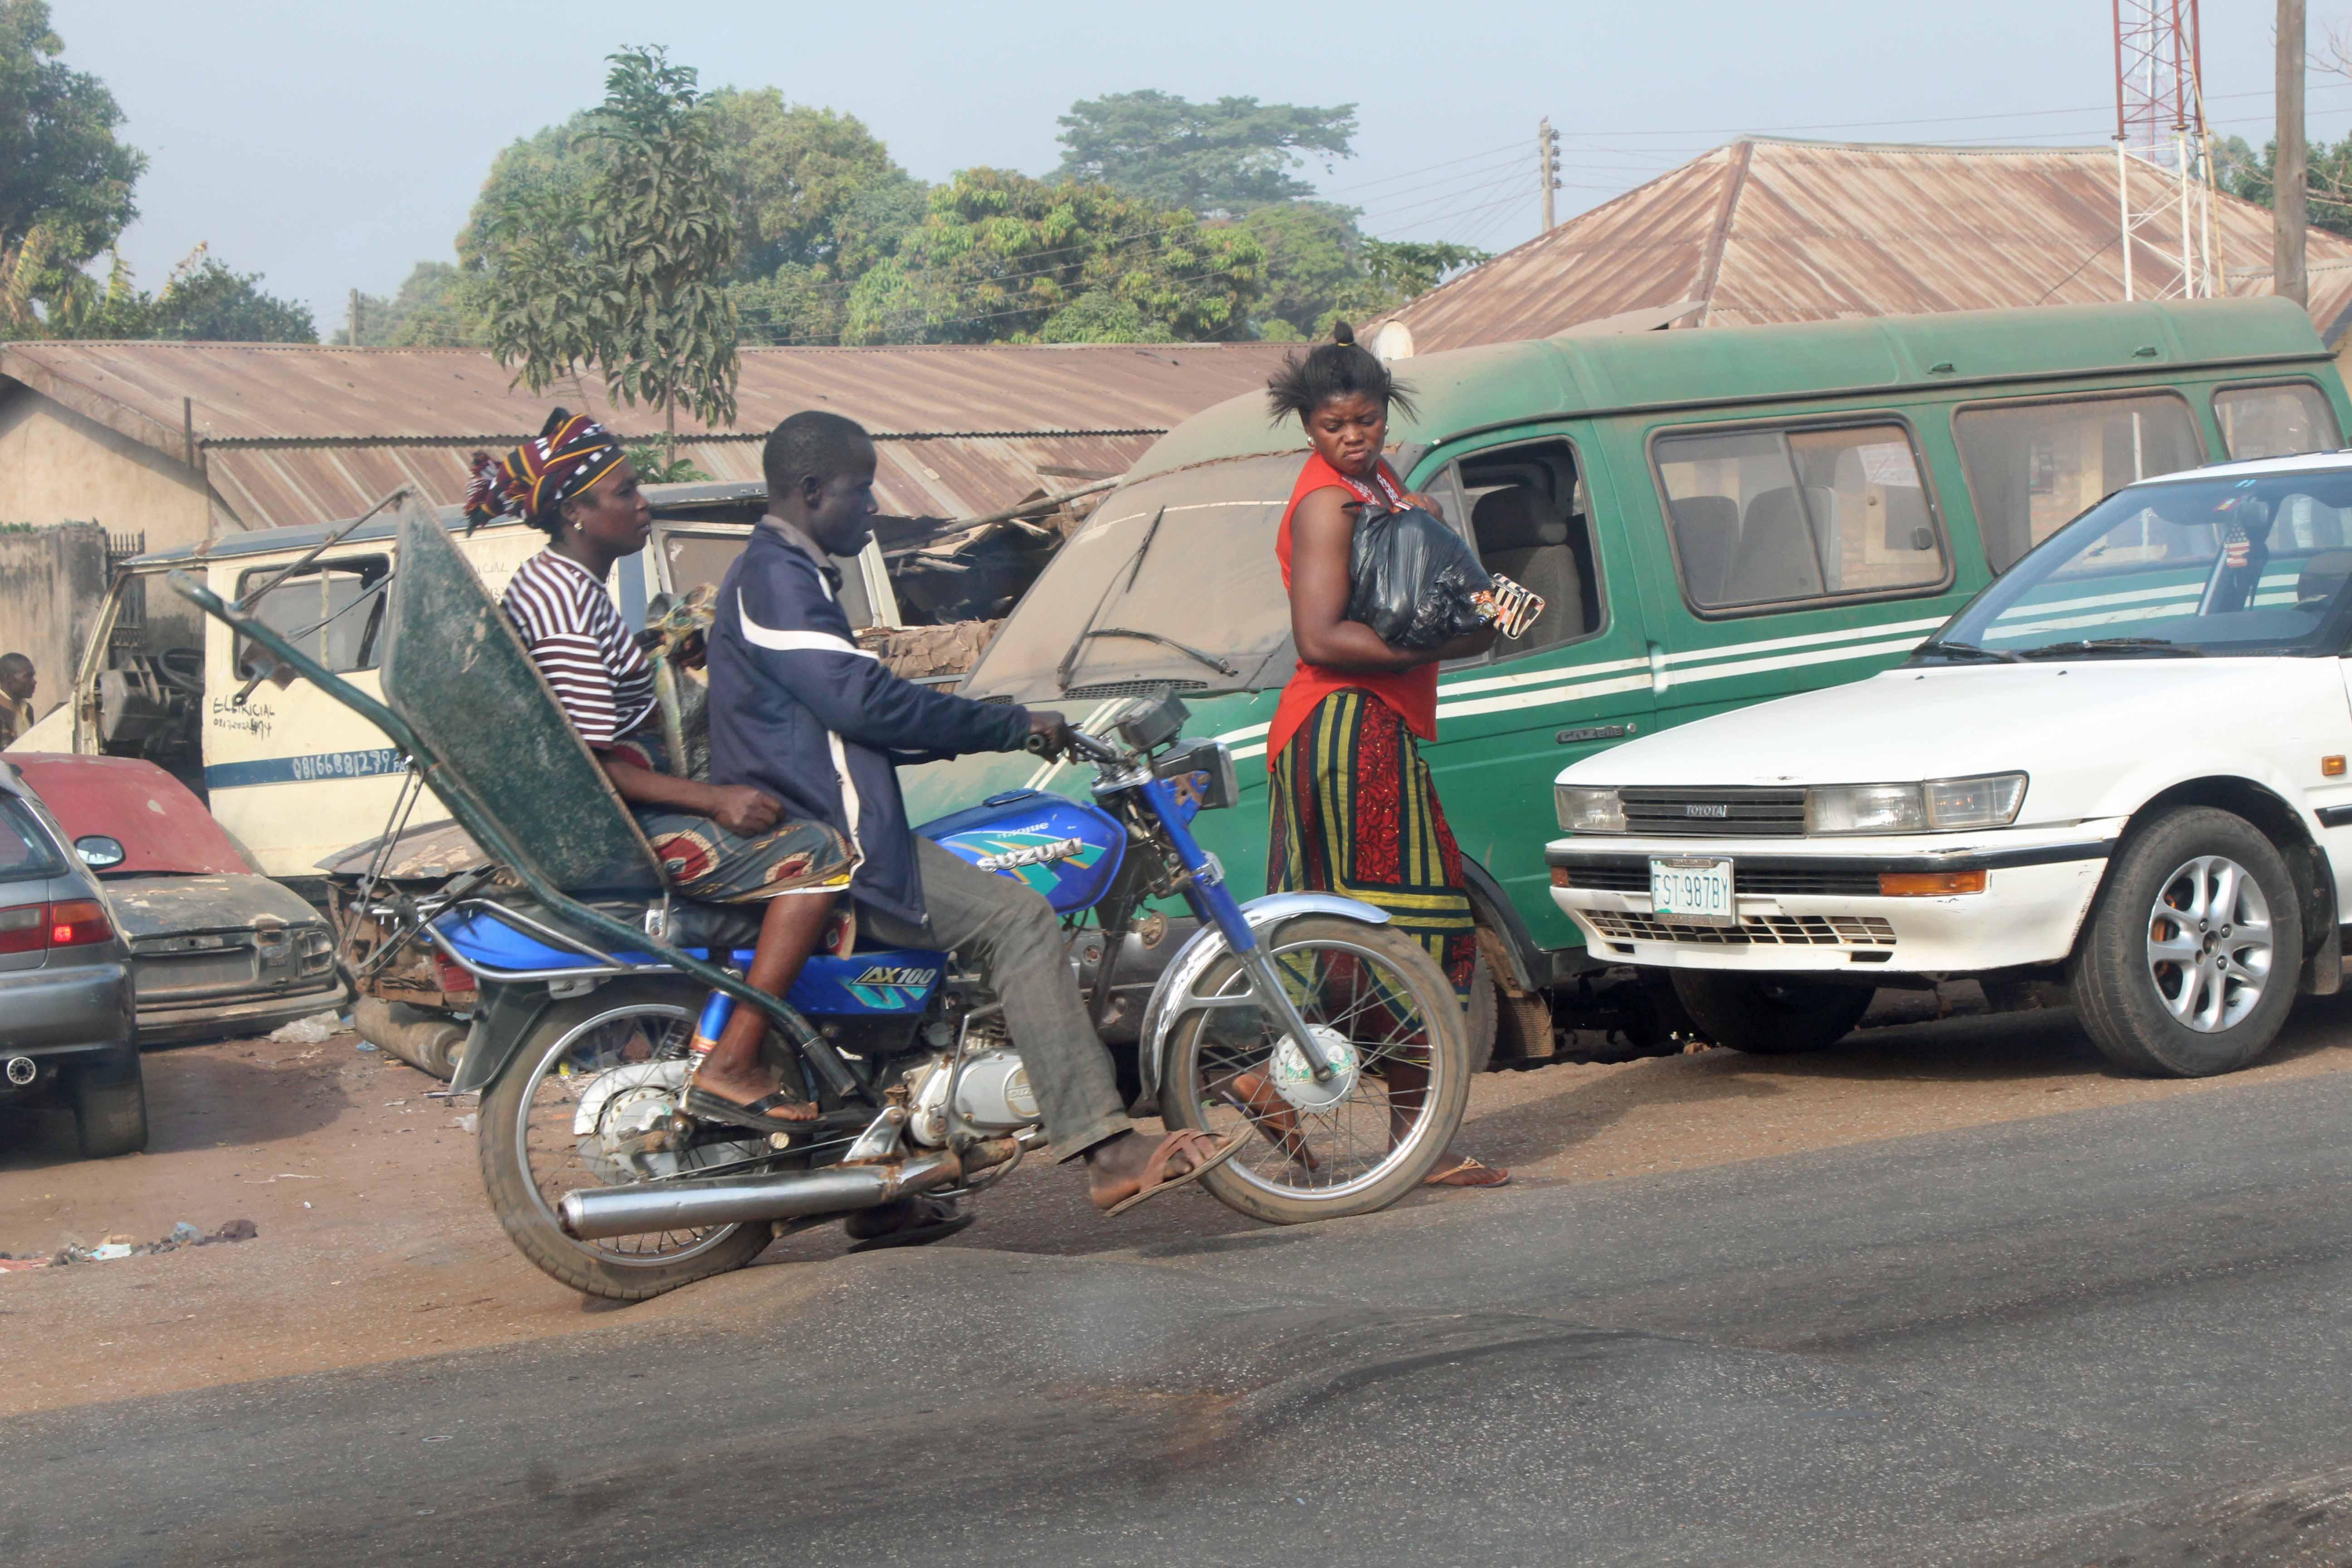 Motorcycling in Enugu Nigeria